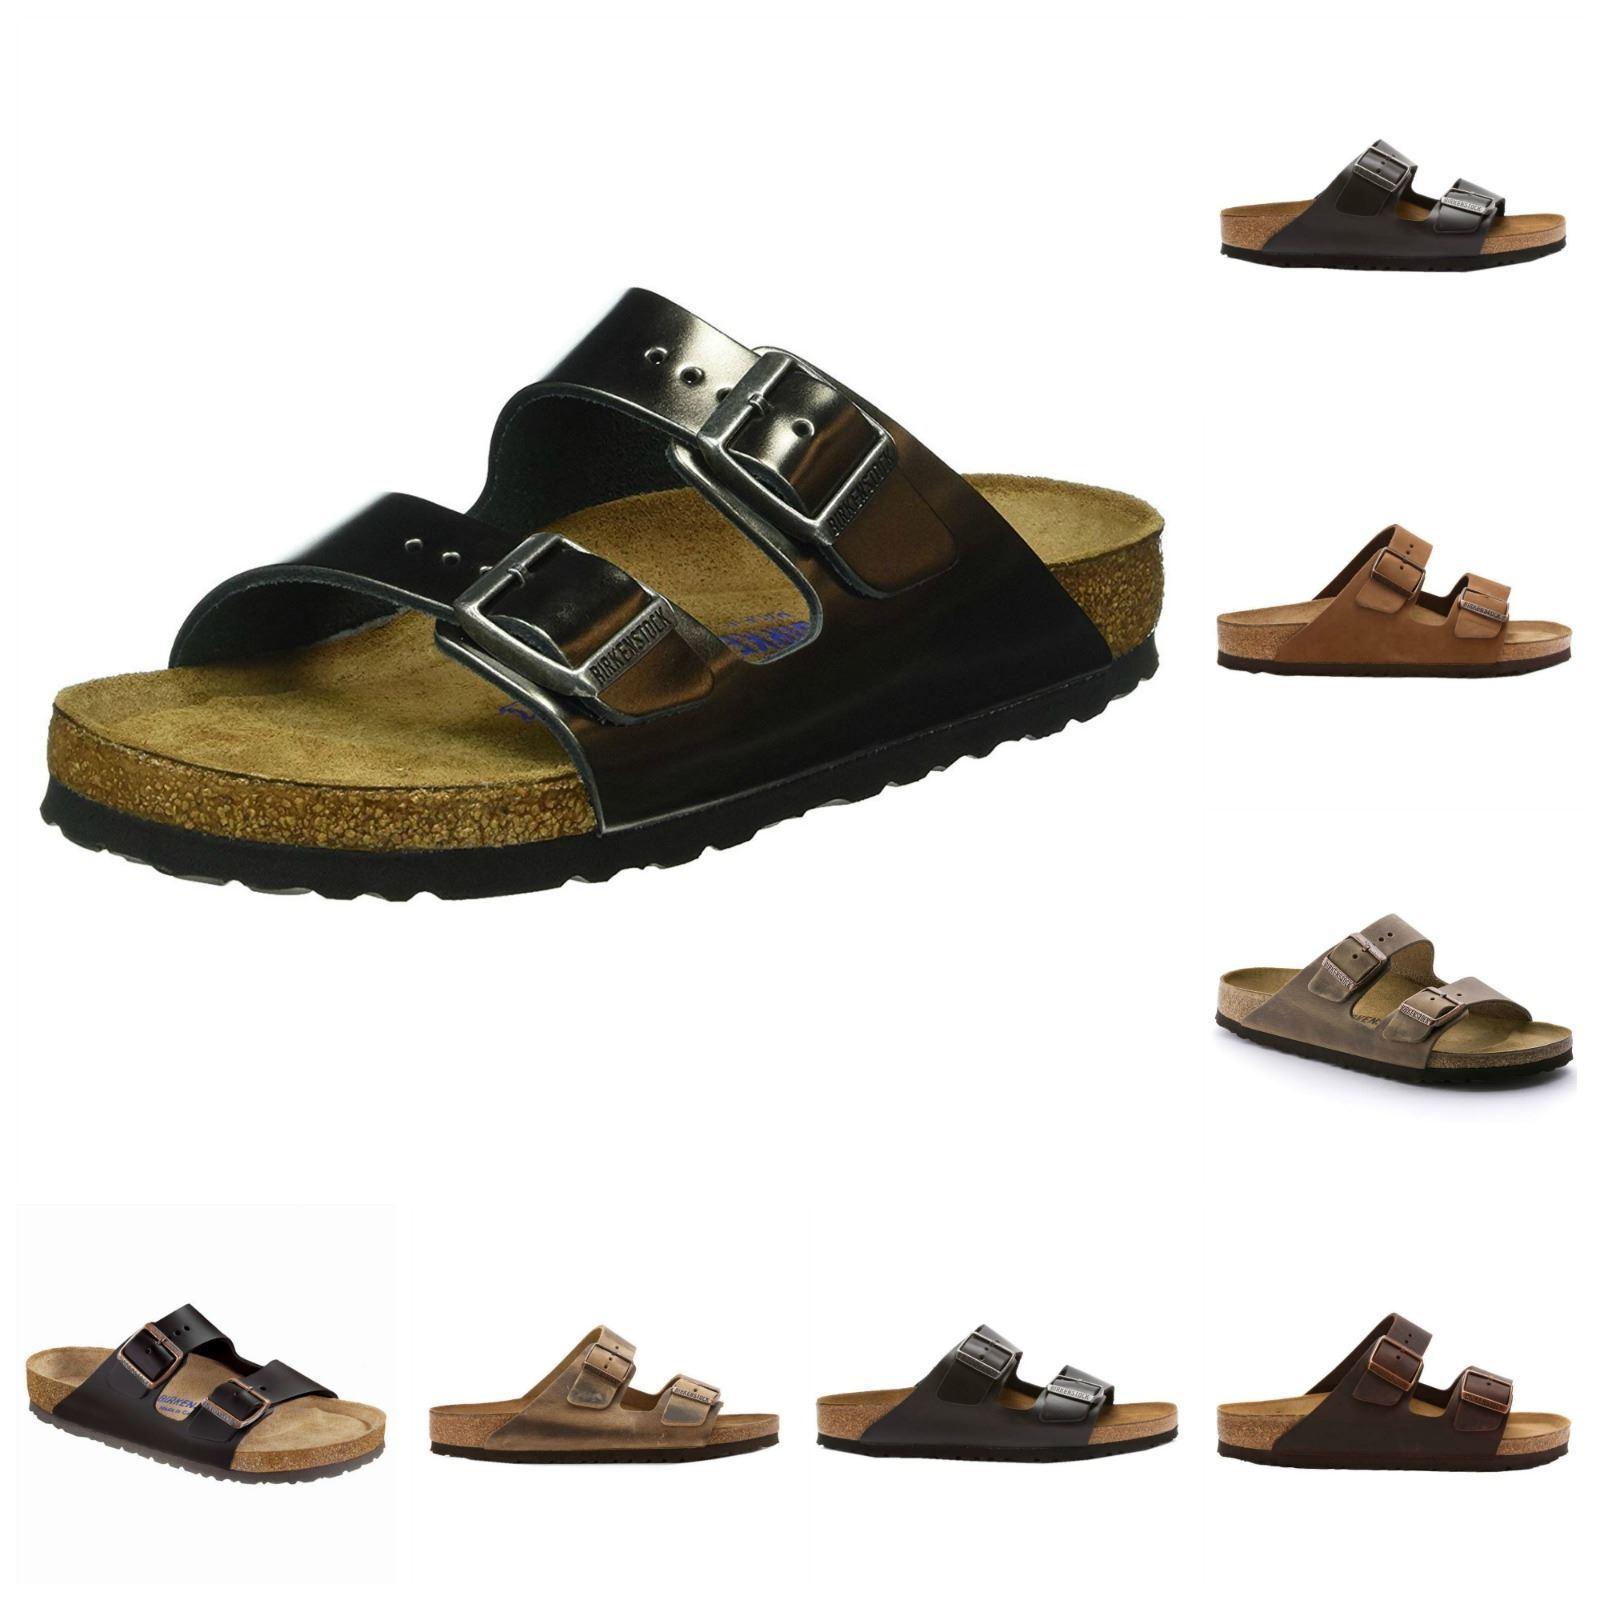 Birkenstock Arizona Leather Double Strap Narrow Sandal